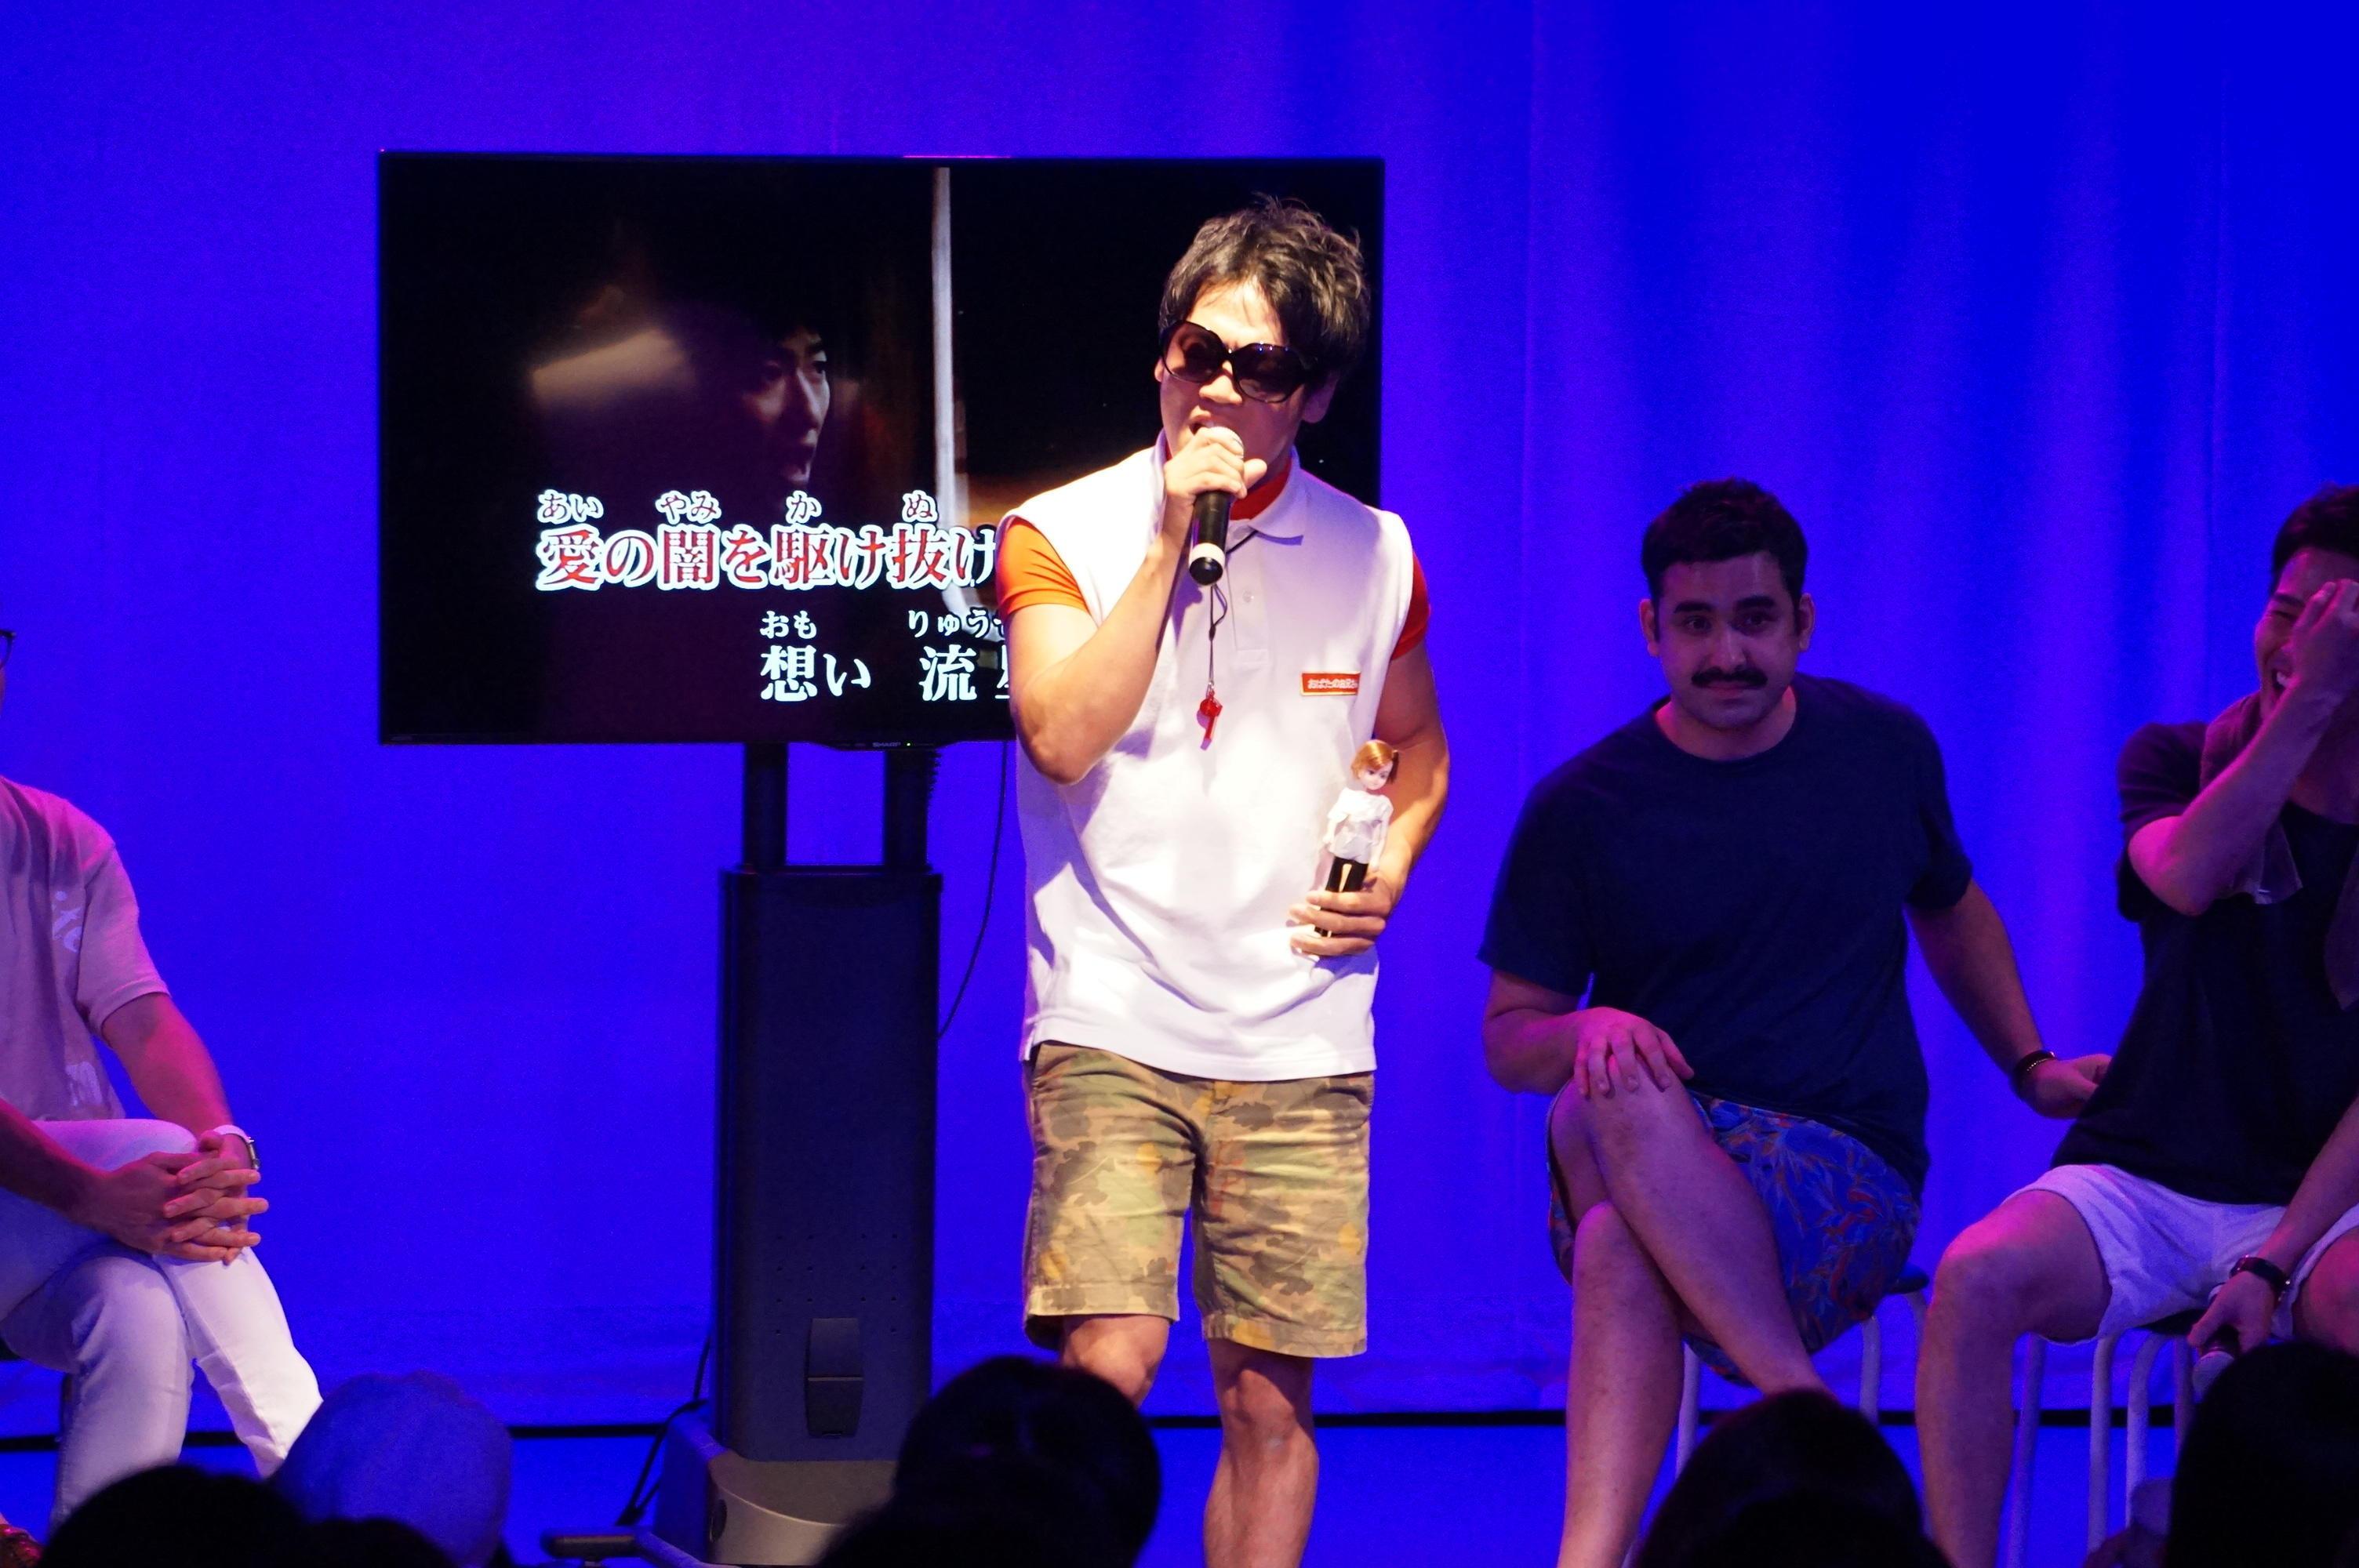 http://news.yoshimoto.co.jp/20160729182929-f84a79e8a79500266c4398ddde7ce6818eebf829.jpg